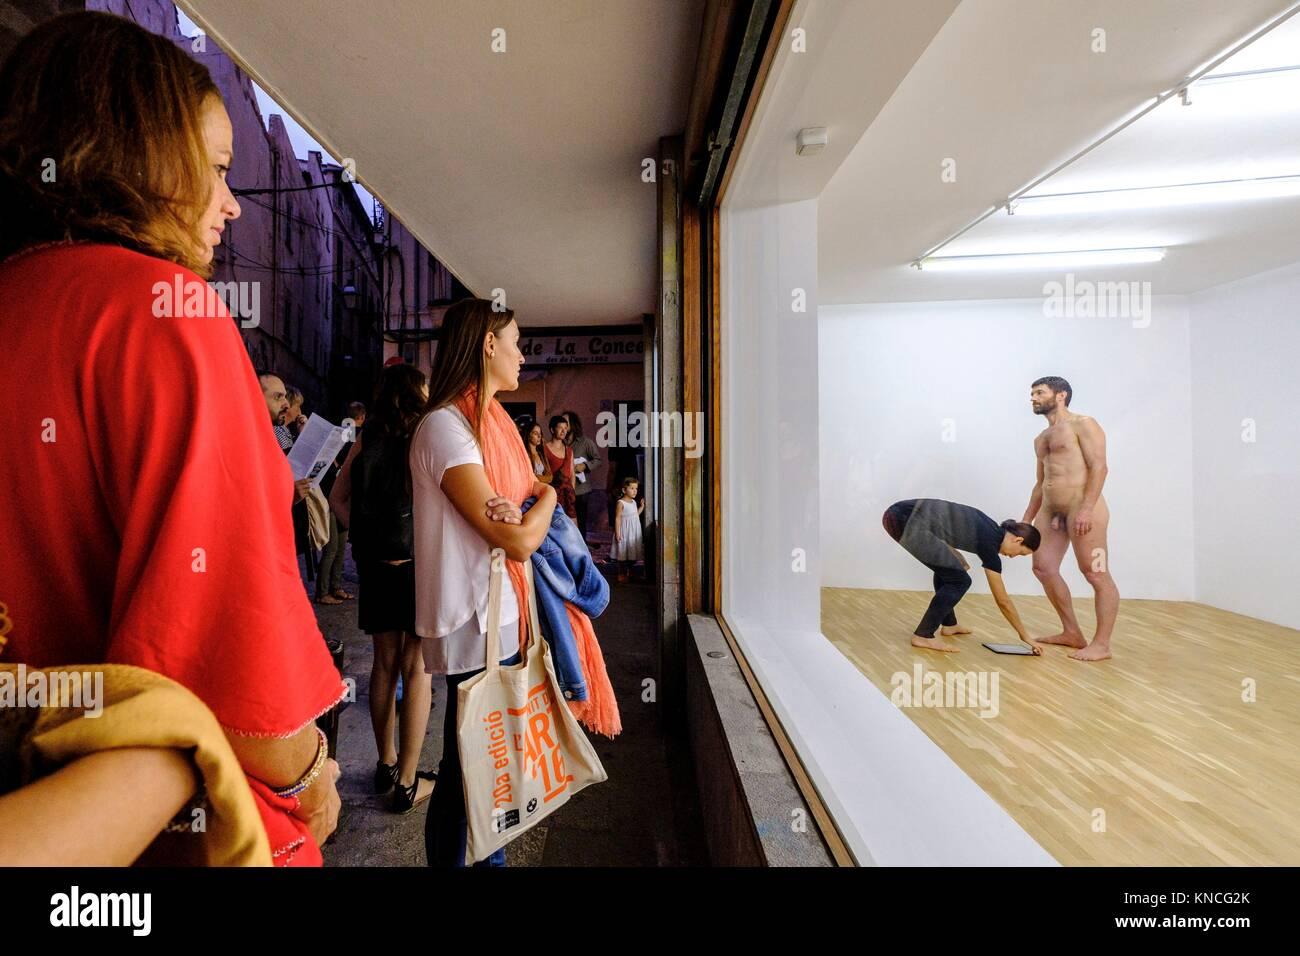 L21 GALLERY, performance , lenguaje-prologo, , Nit de l Art, Palma, Mallorca, balearic islands, spain, europe. - Stock Image